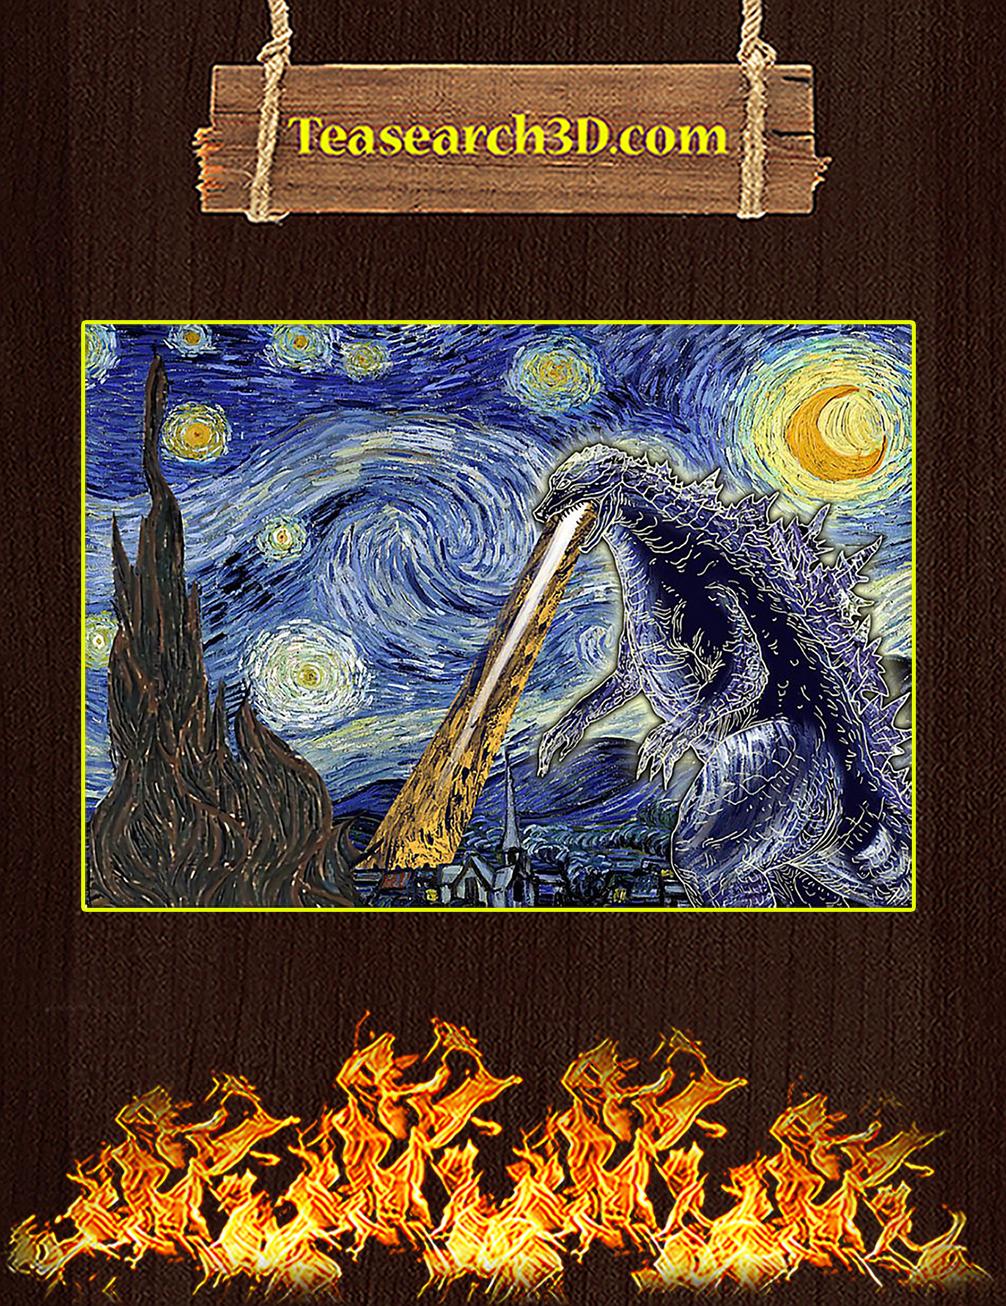 Starry night with godzilla poster